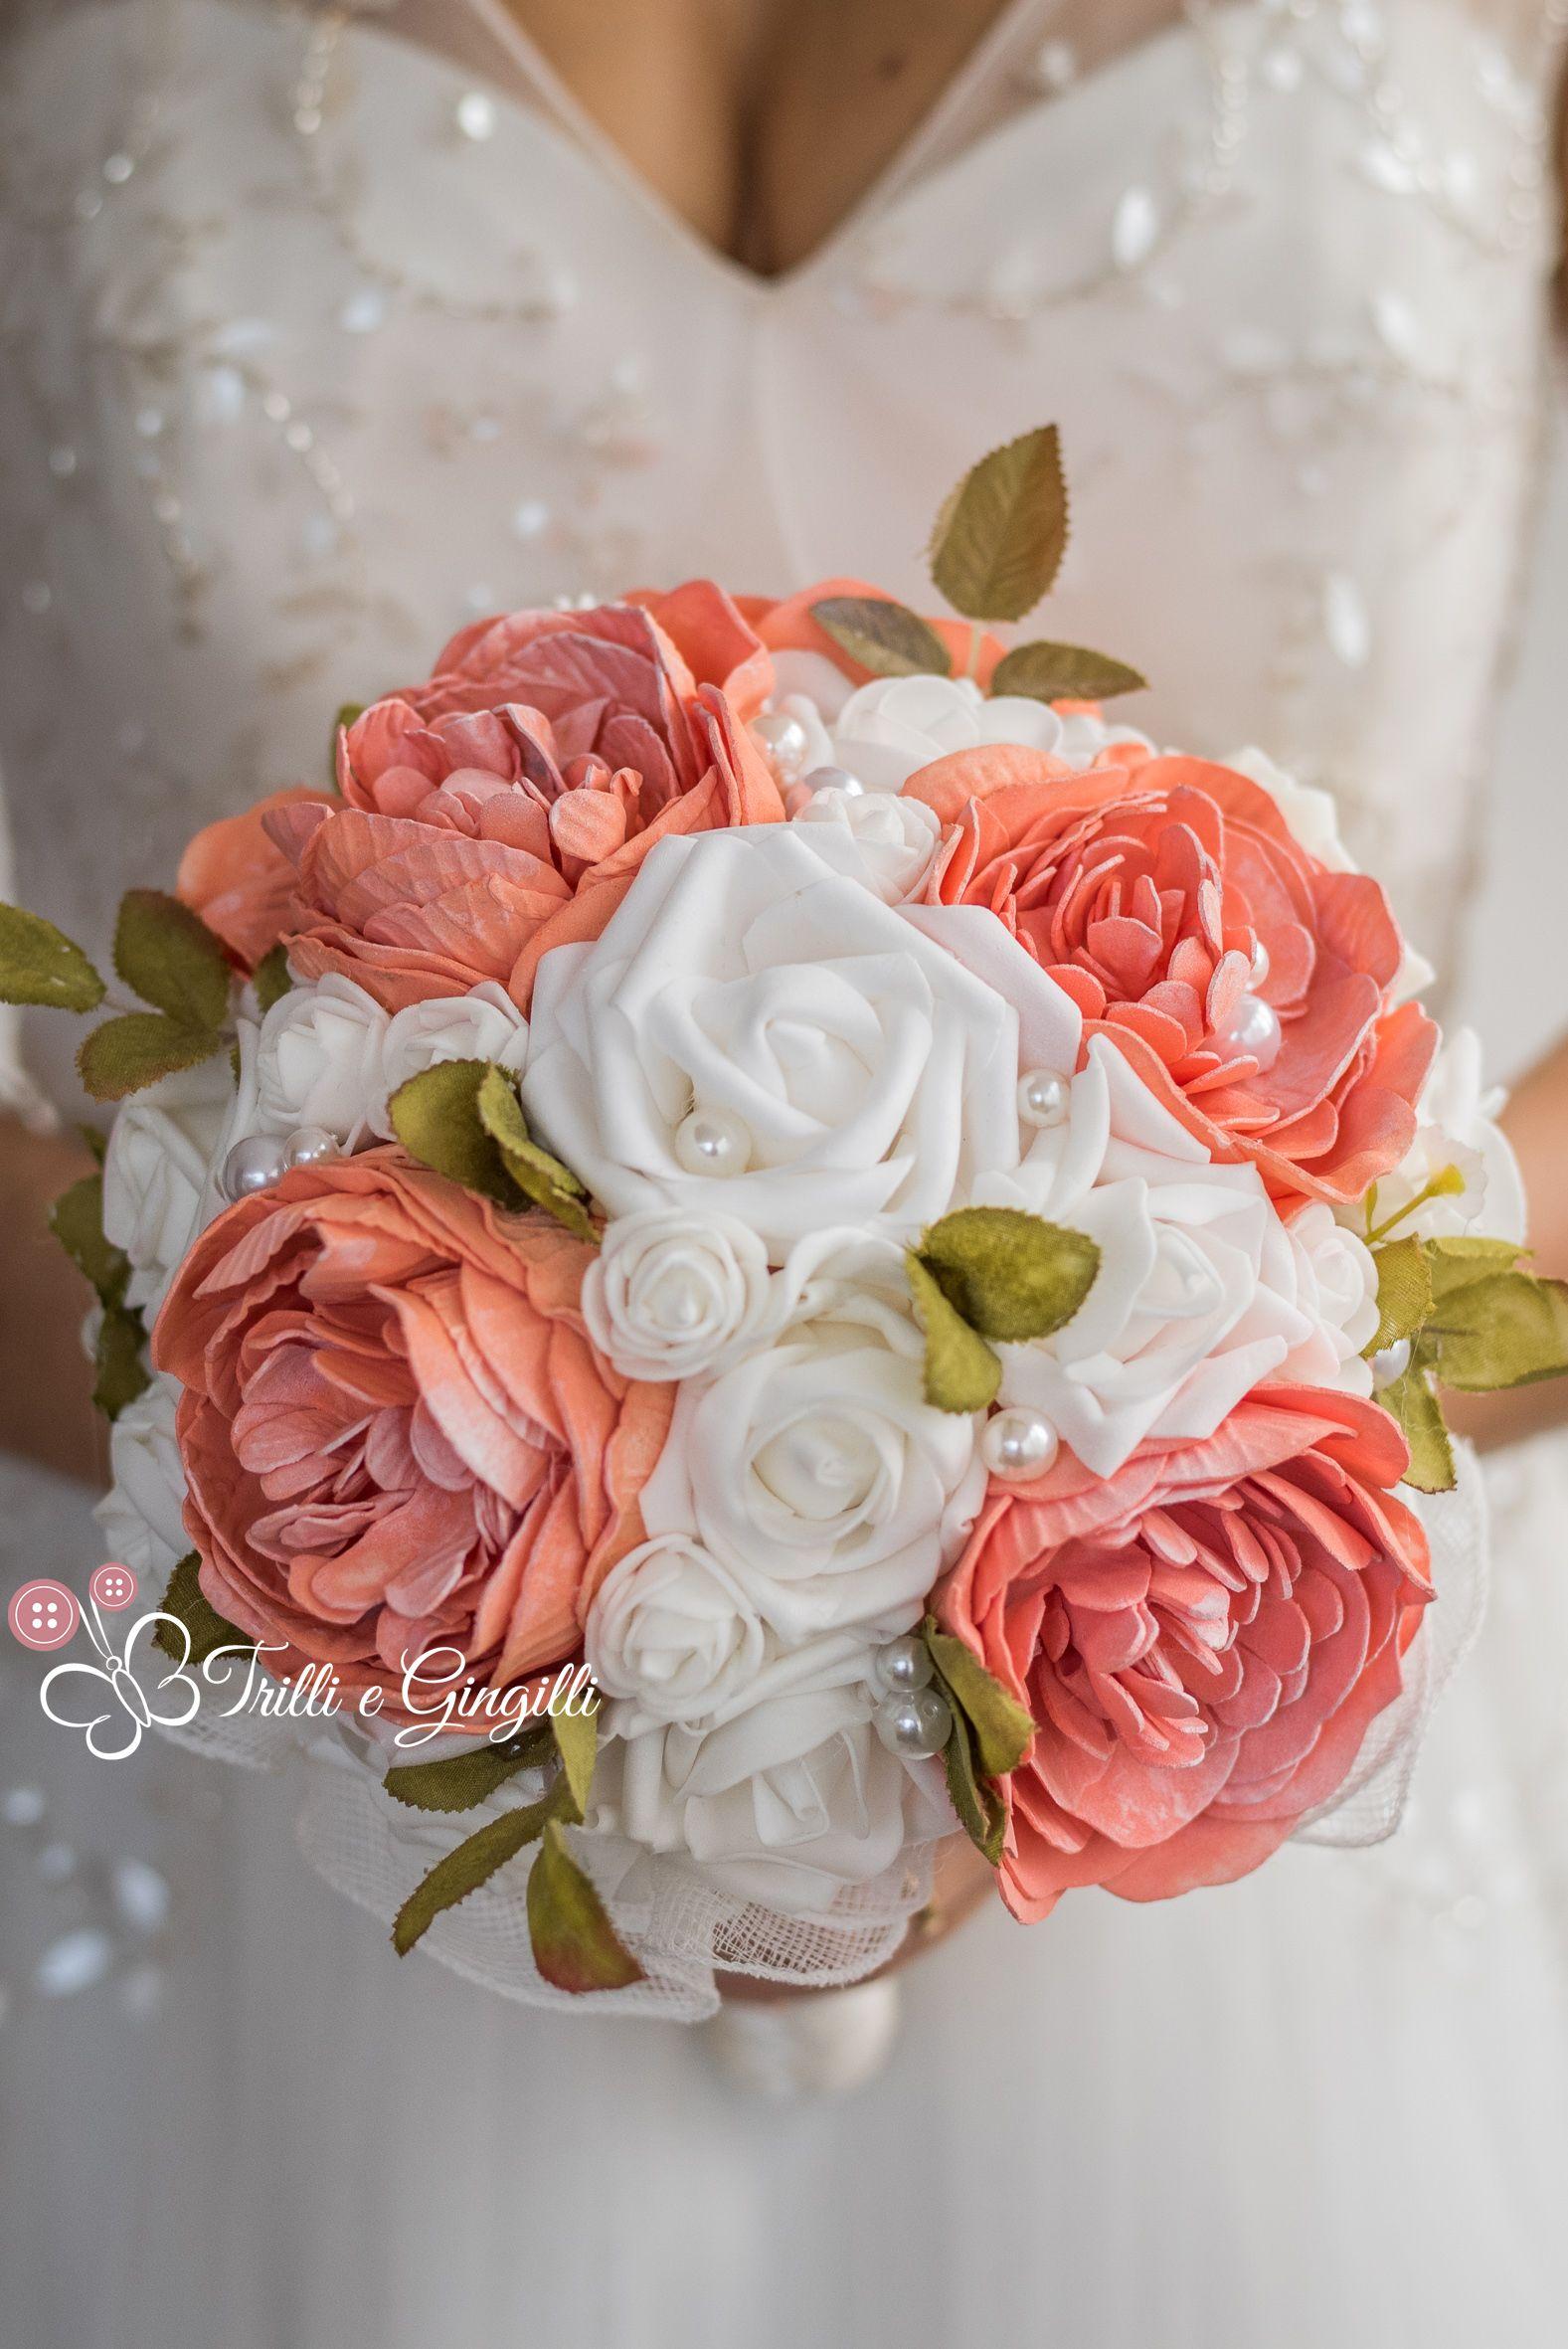 Bouquet Sposa Color Pesca.Peach Peony Bridal Bouquet Bouquet Sposa Peonie Pesca By Trilli